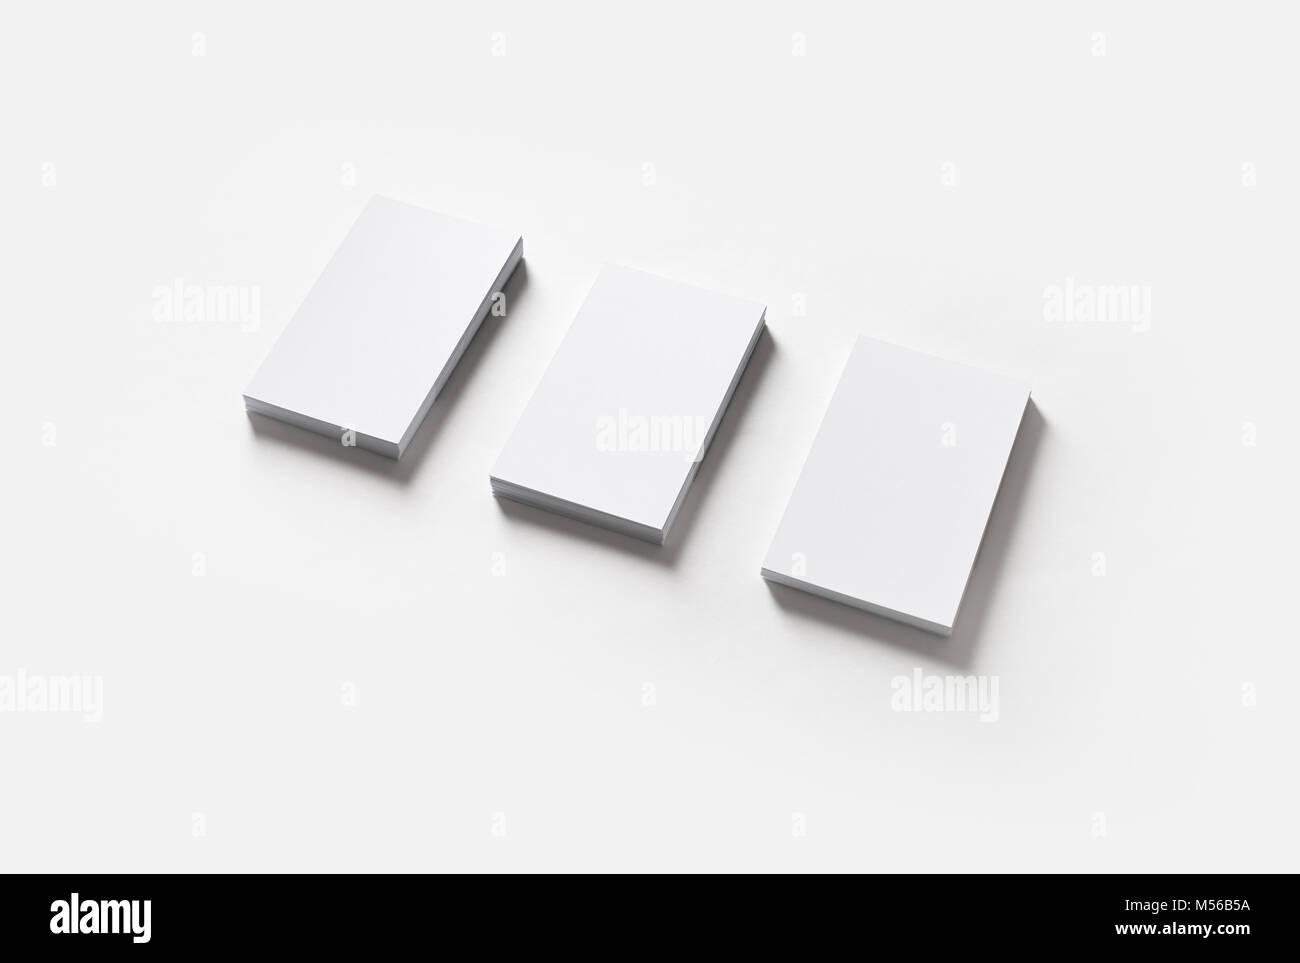 Three blank business cards Stock Photo: 175317446 - Alamy